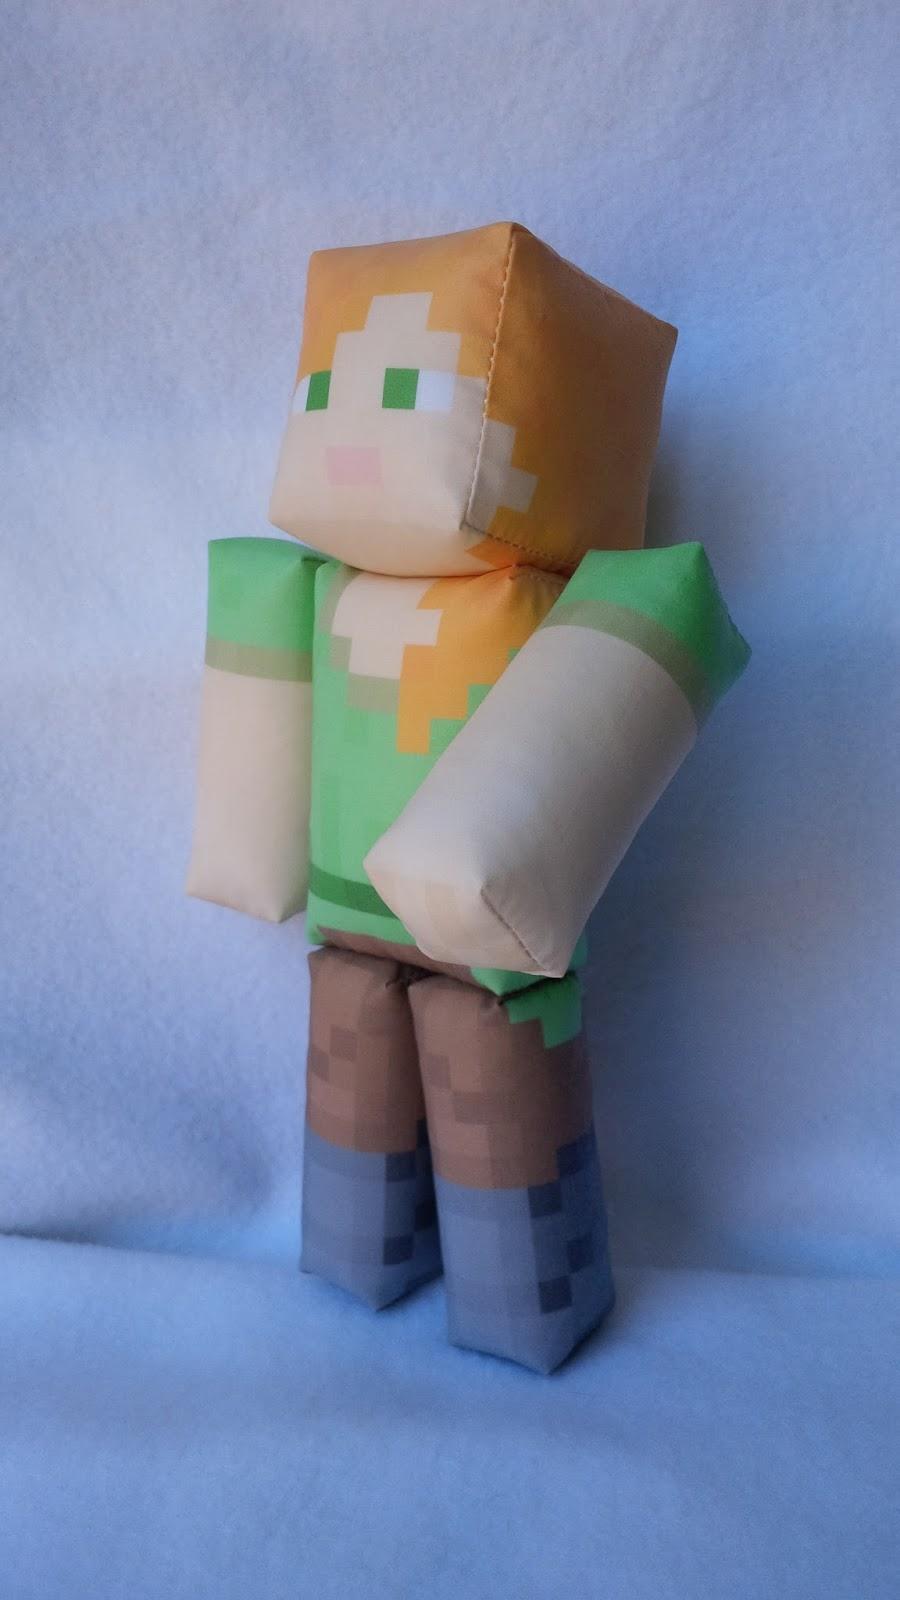 Craftingnerdy Minecraft Inspired Steve And Alex Plush Toys